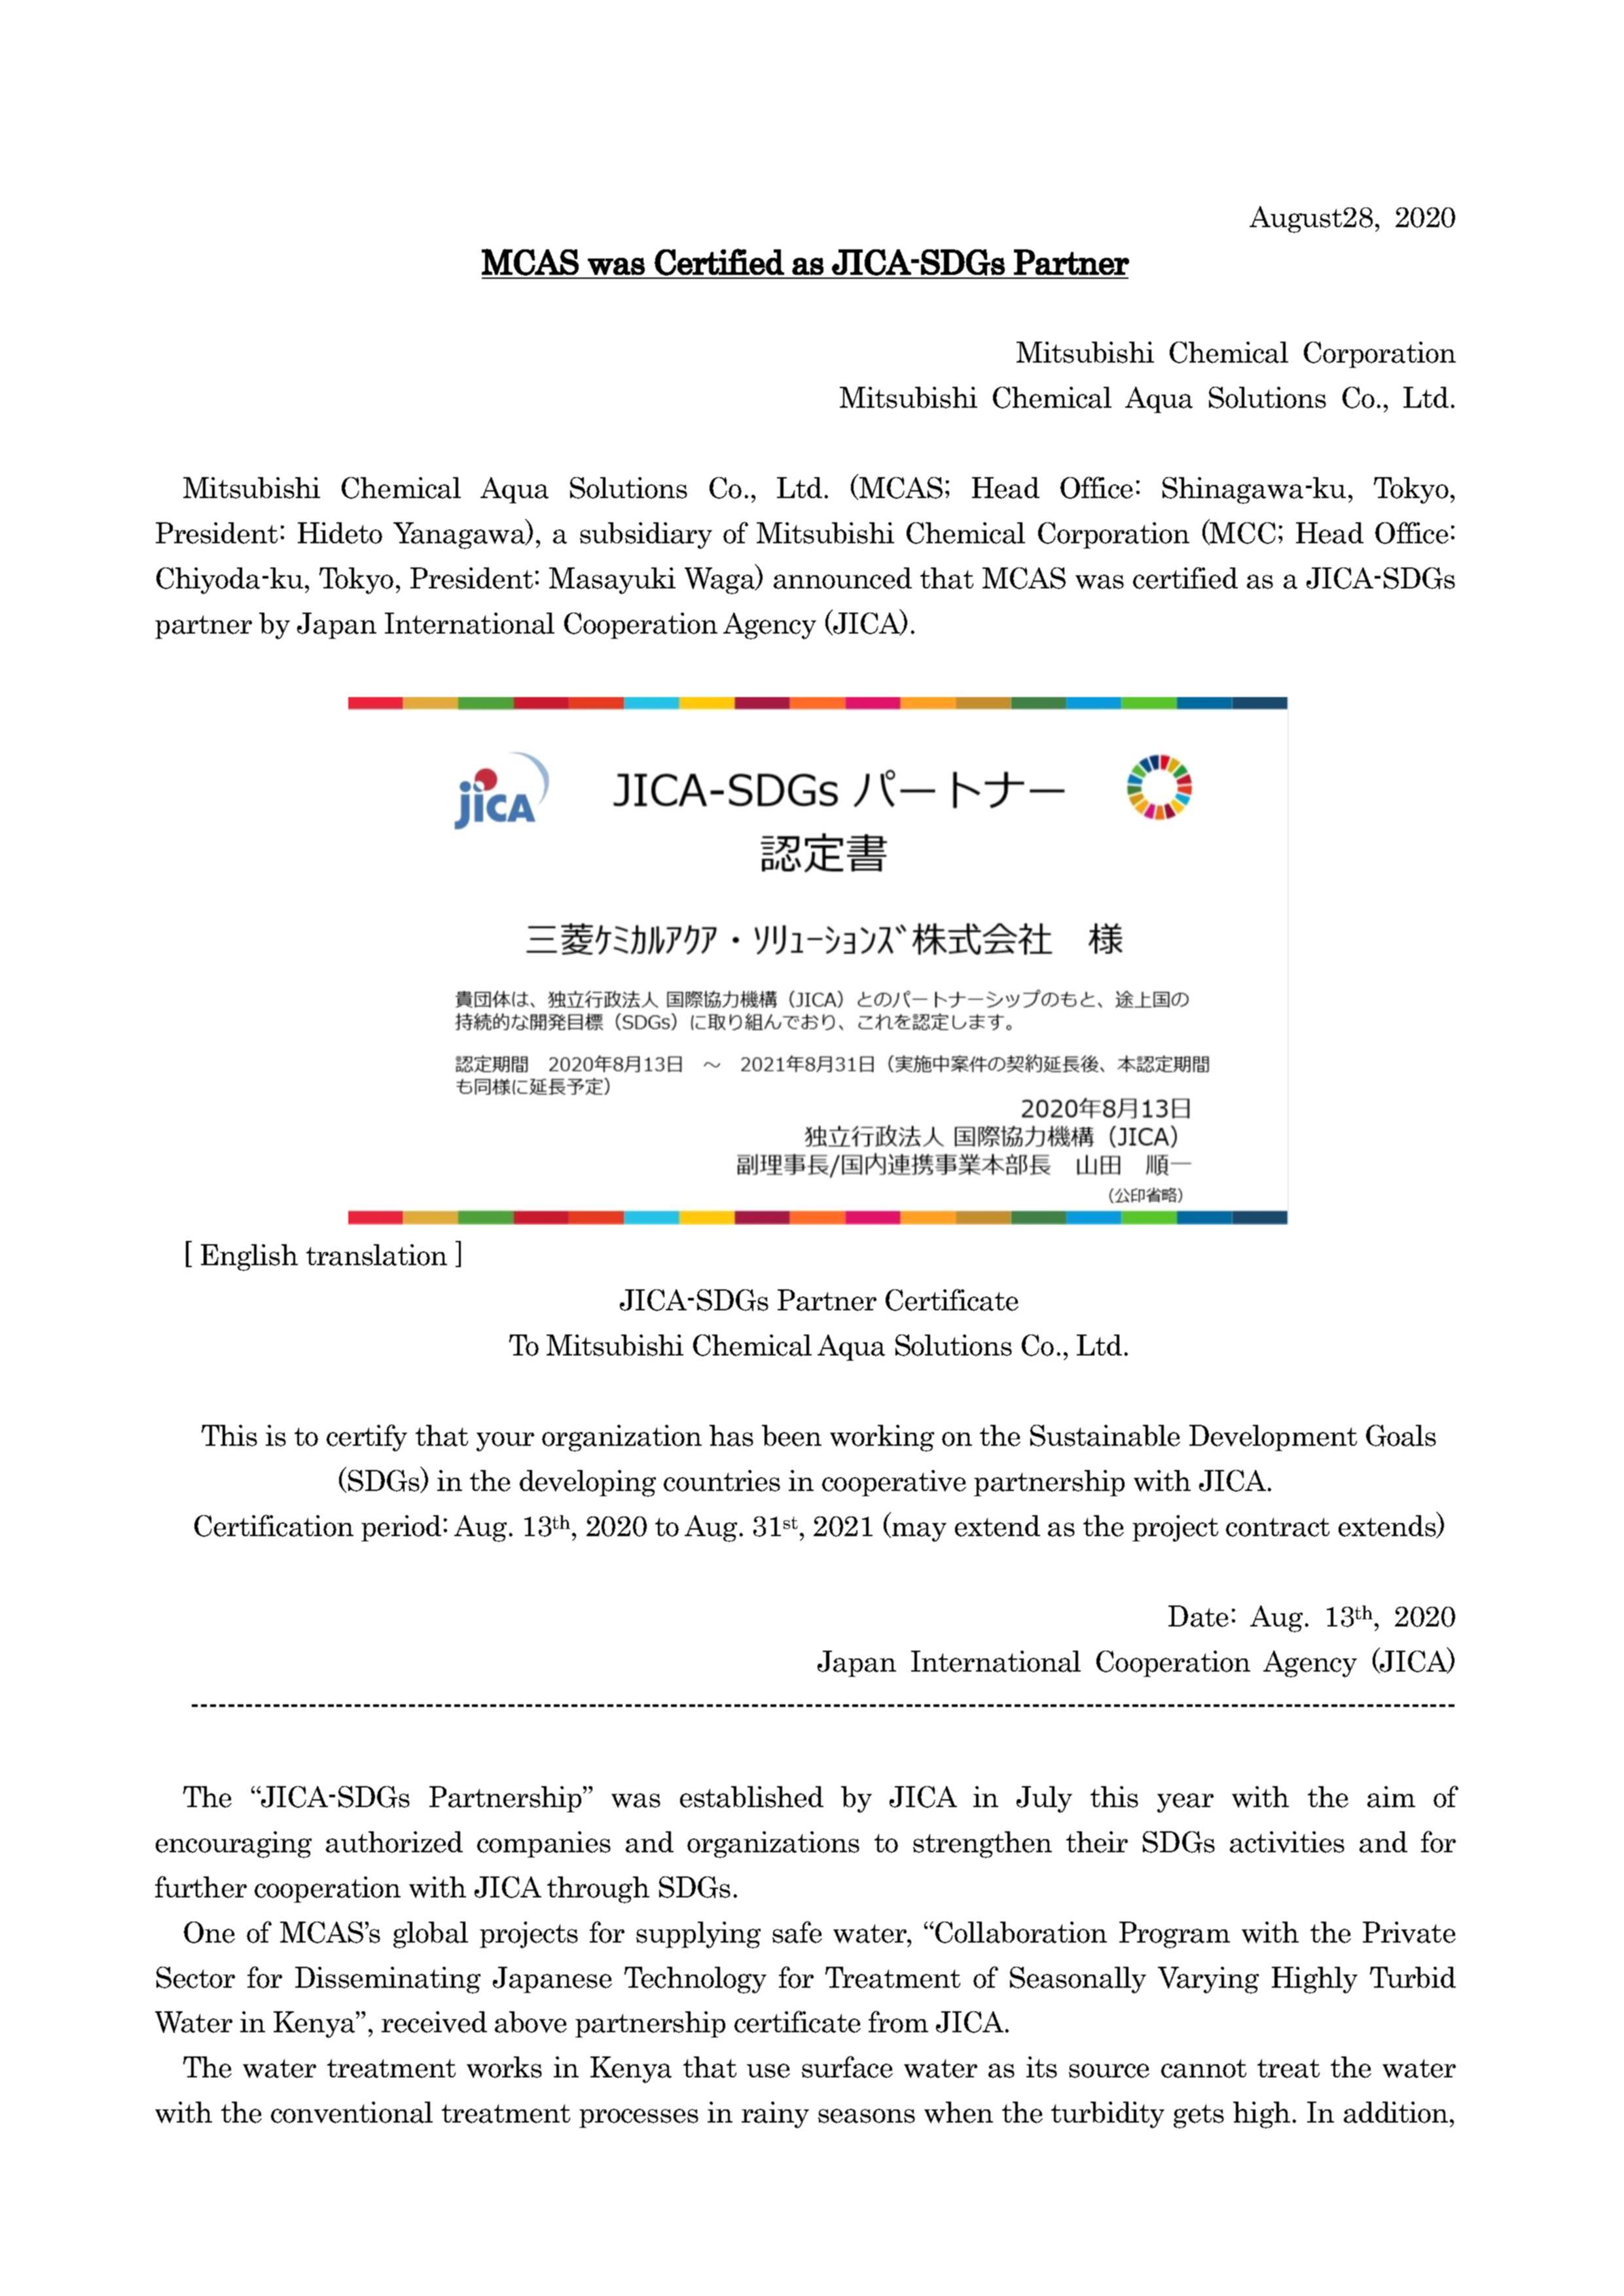 20200828_MCAS certifed as JICA-SDGs Partner_1.jpg